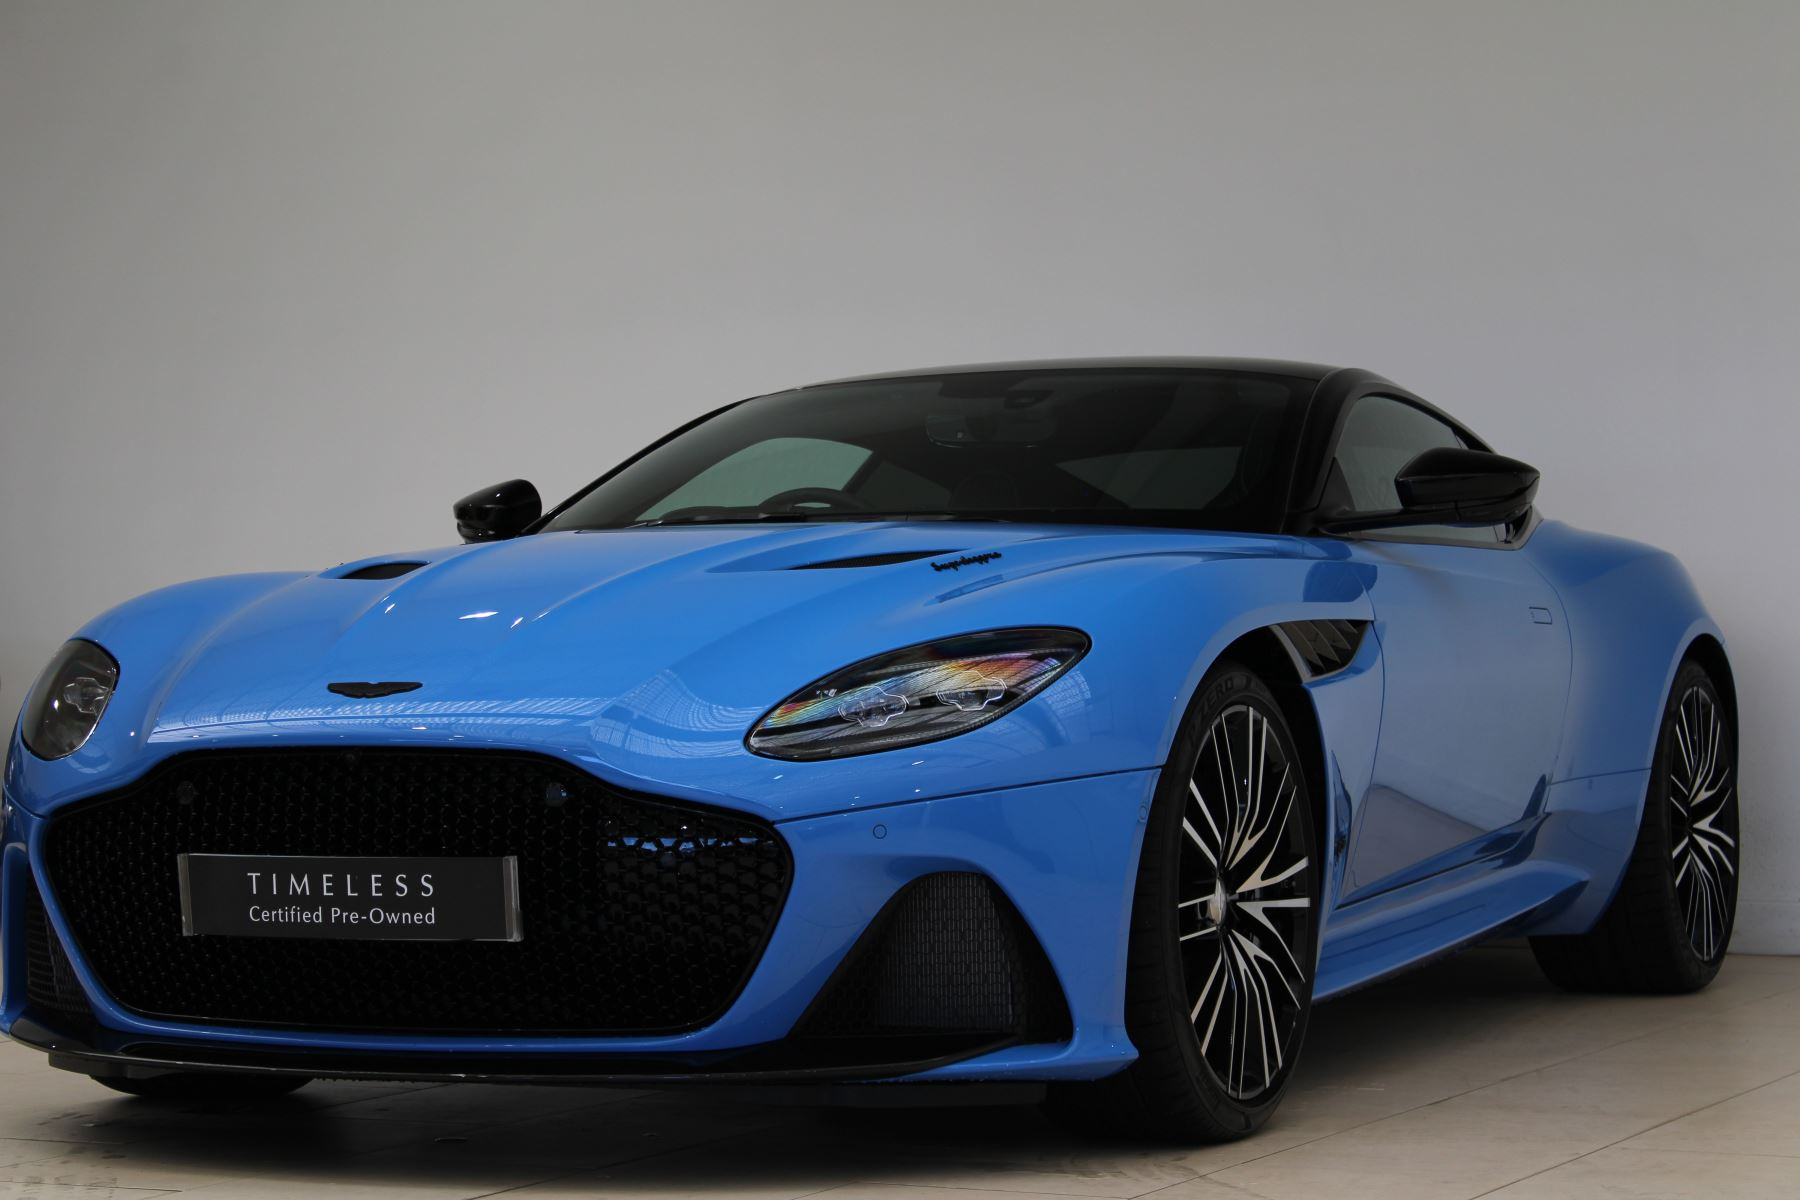 Aston Martin DBS V12 Superleggera Touchtronic Special Ceramic Blue - B&O image 2